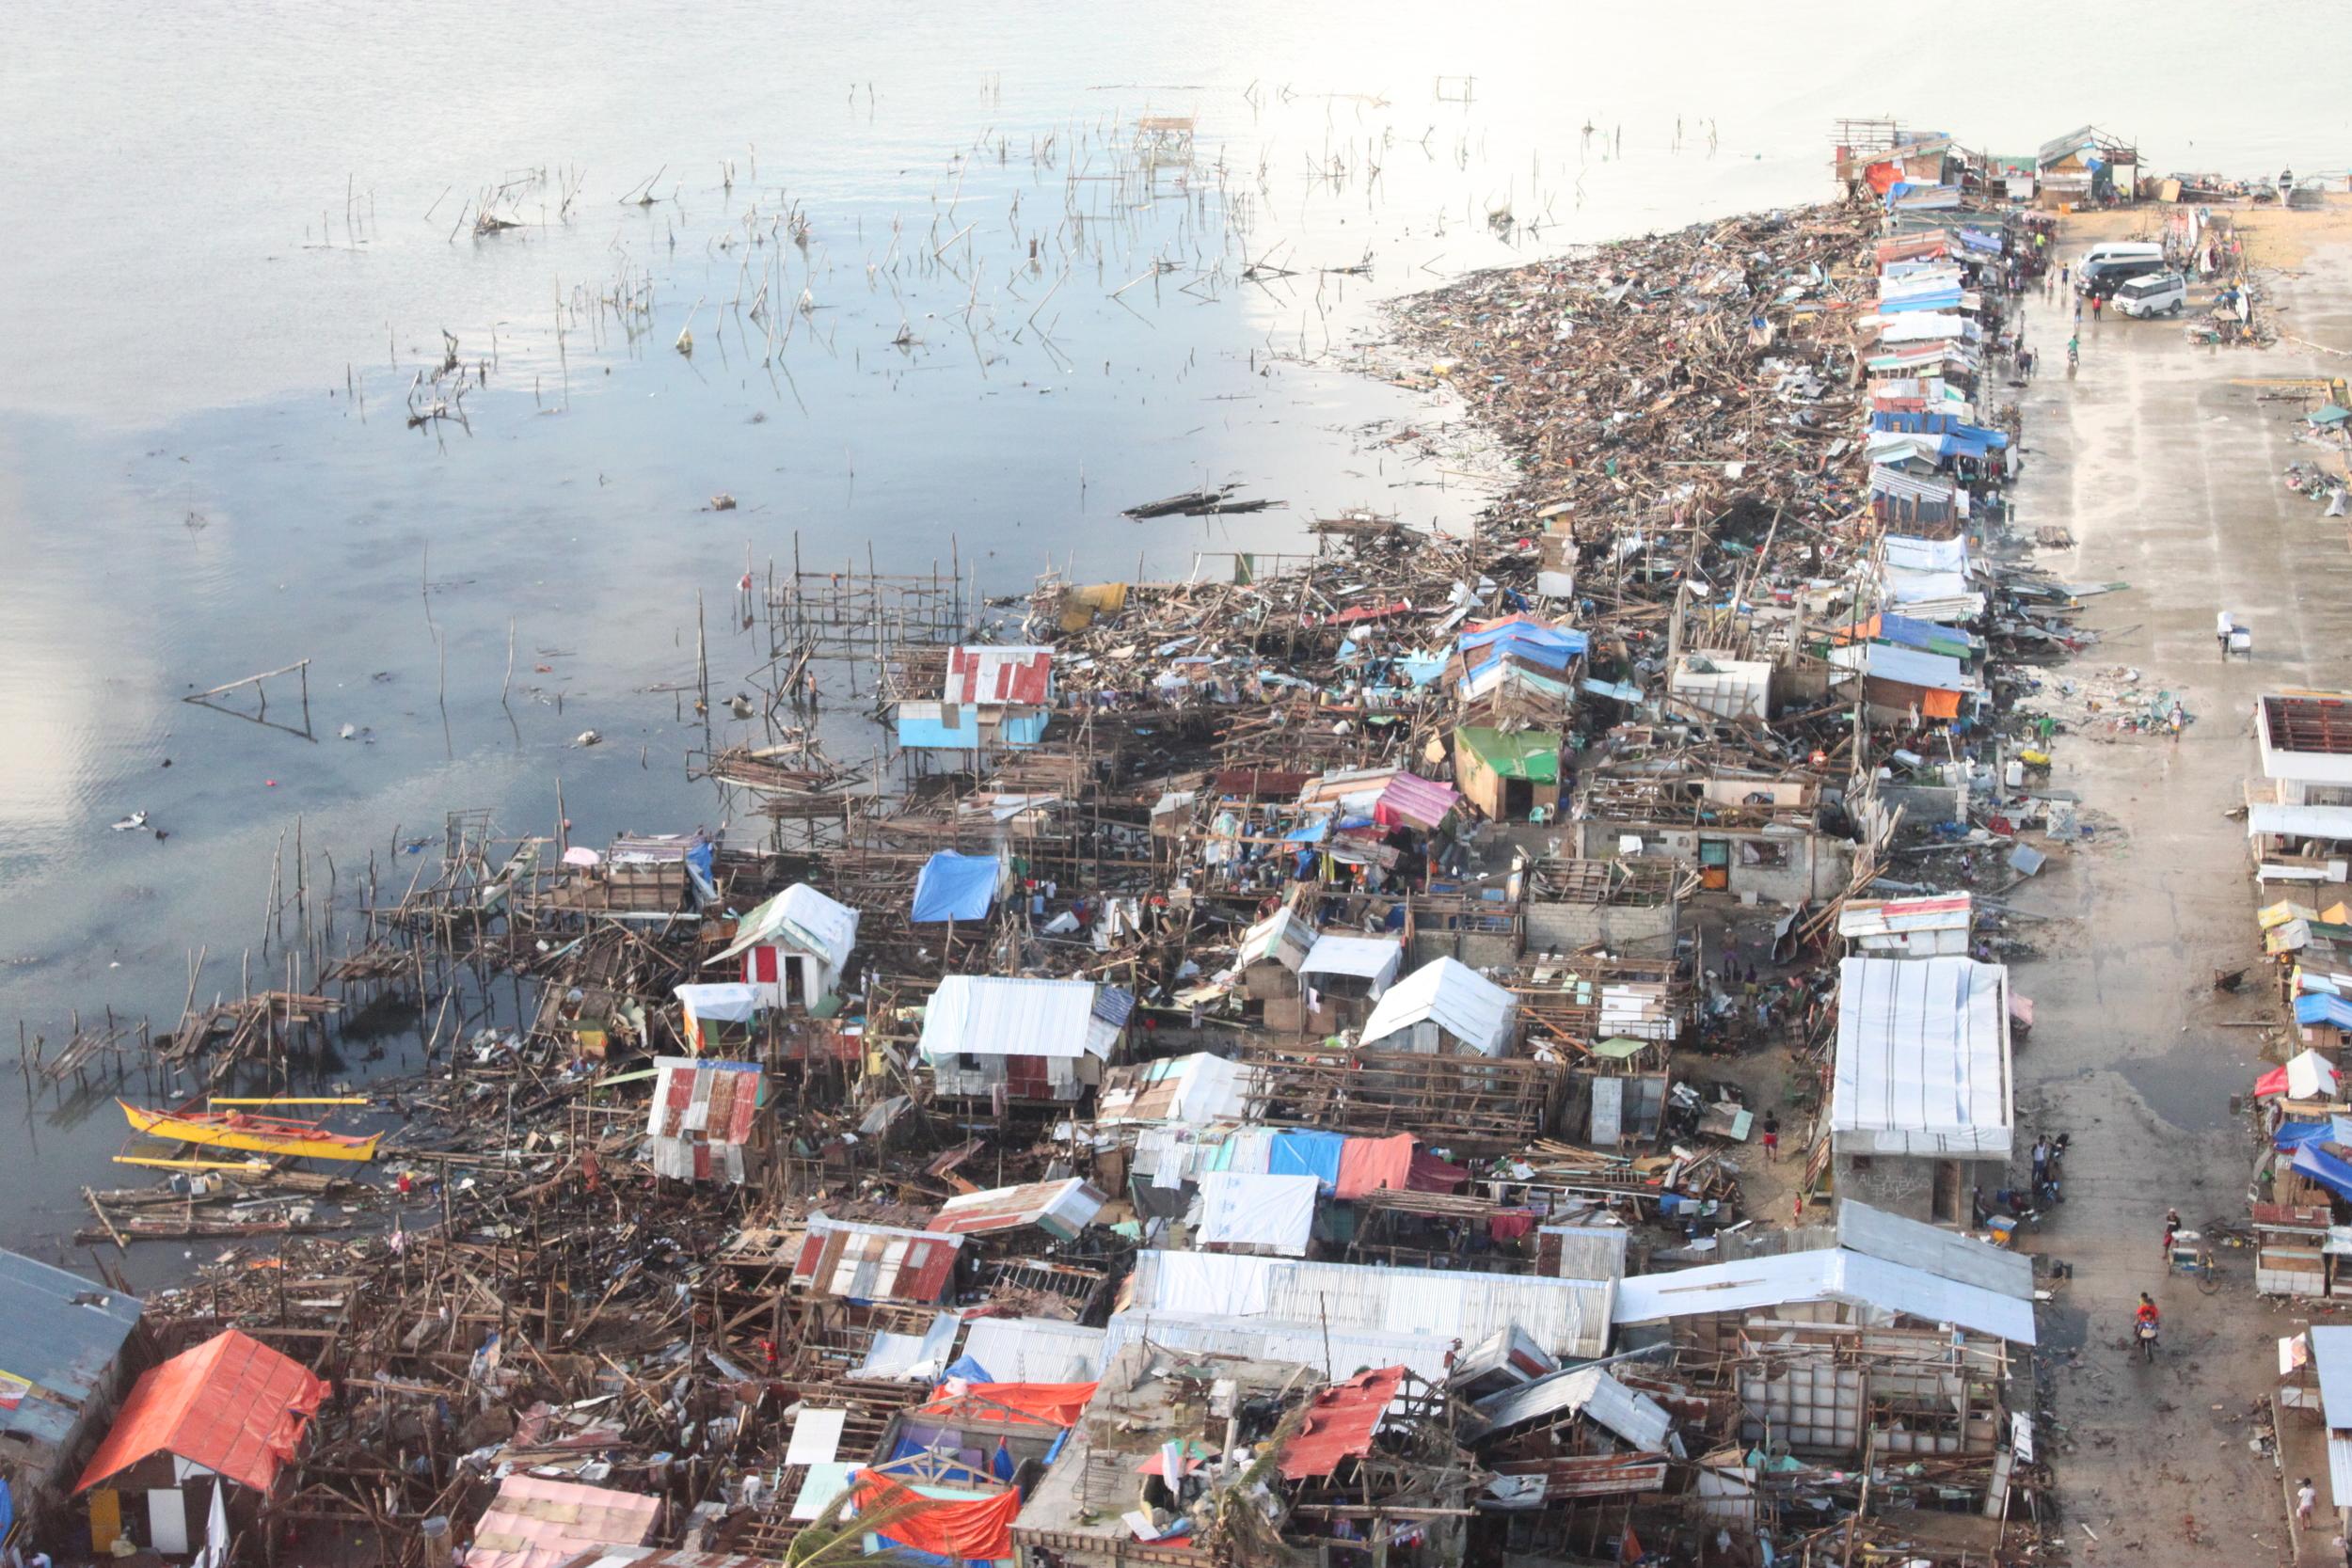 View of devastation in Leyte